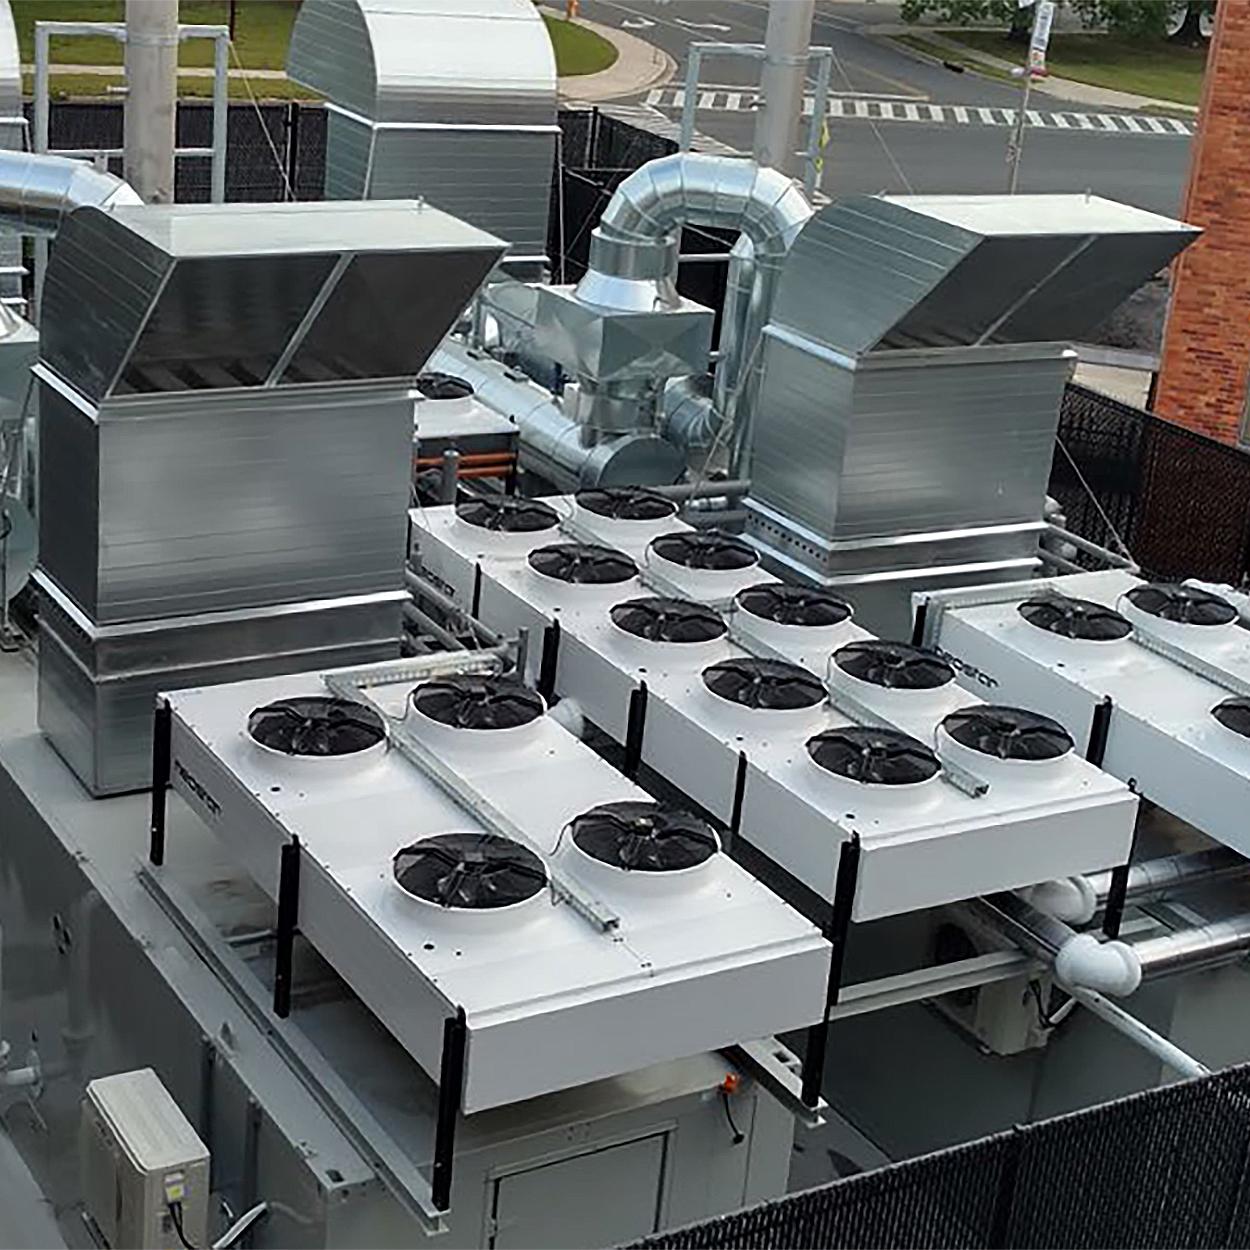 Peninsula Regional Hospital Combined Heat and Power System